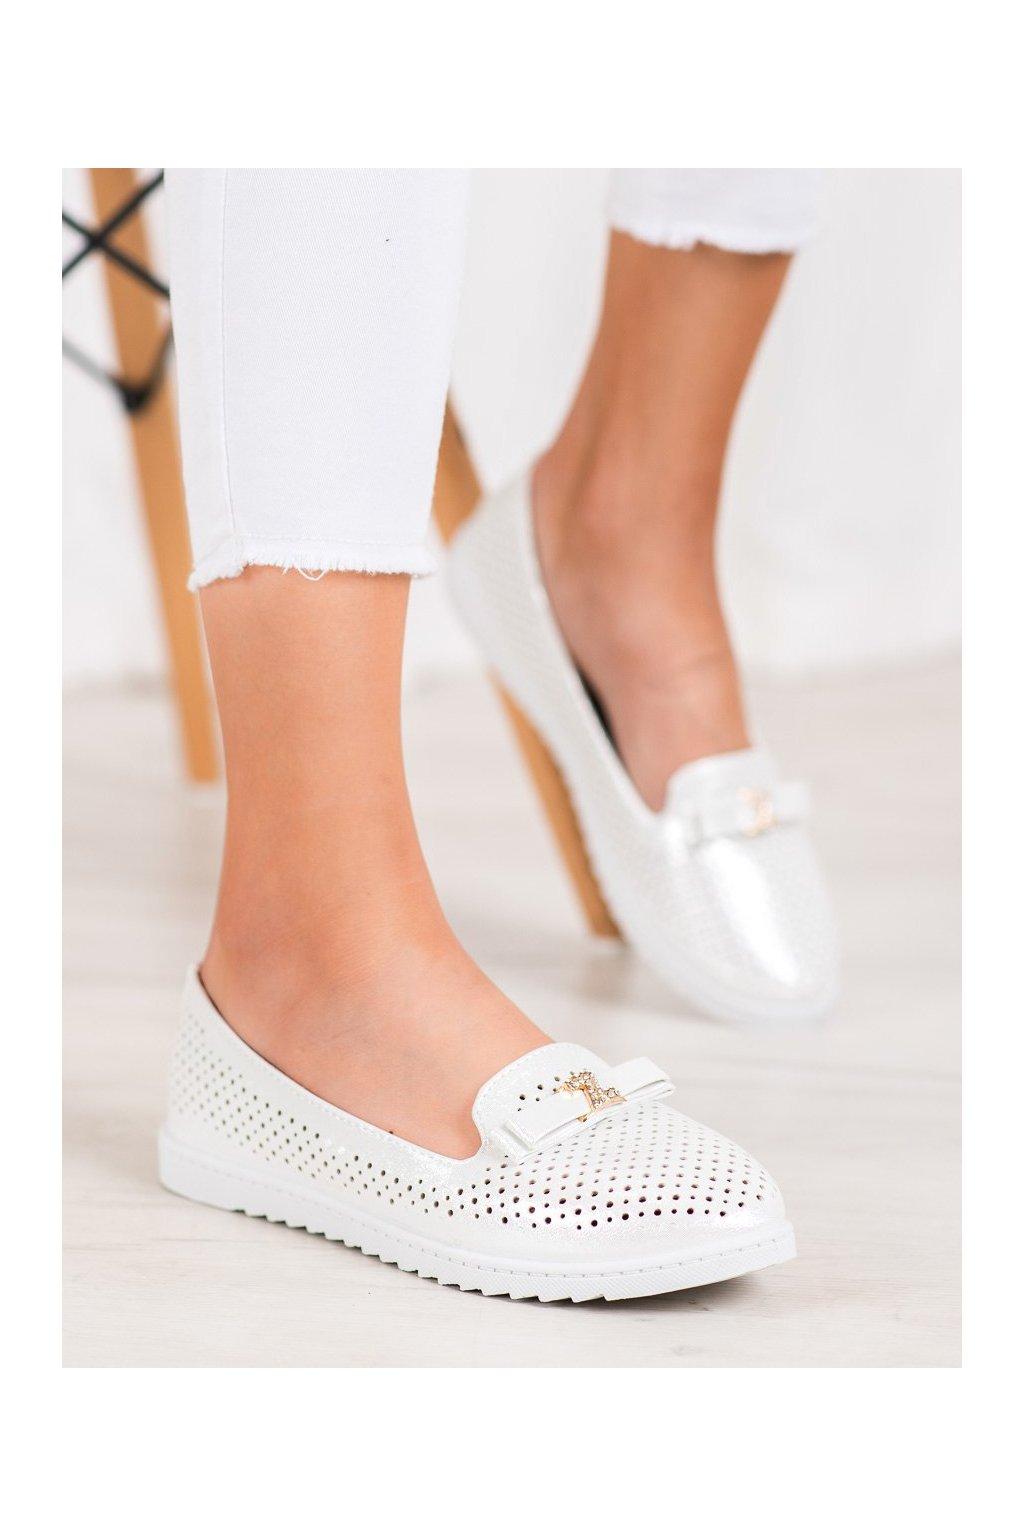 Biele dámske balerínky Weide NJSK Q721W